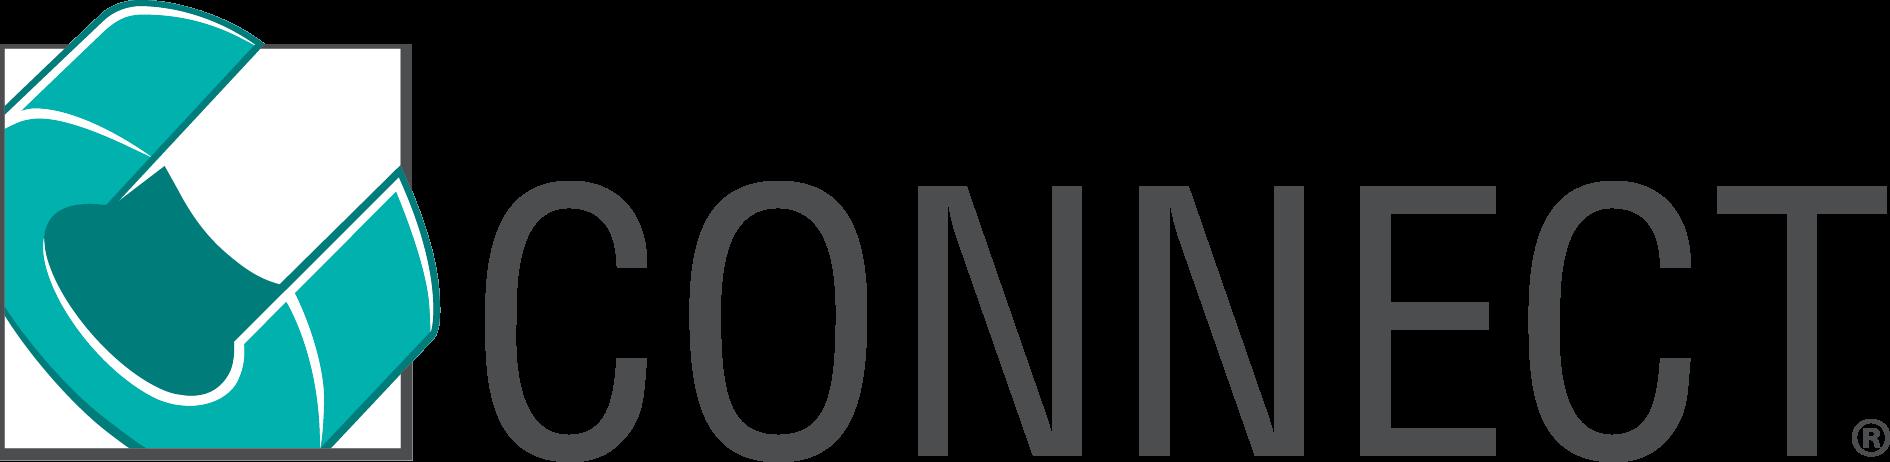 logo-marques